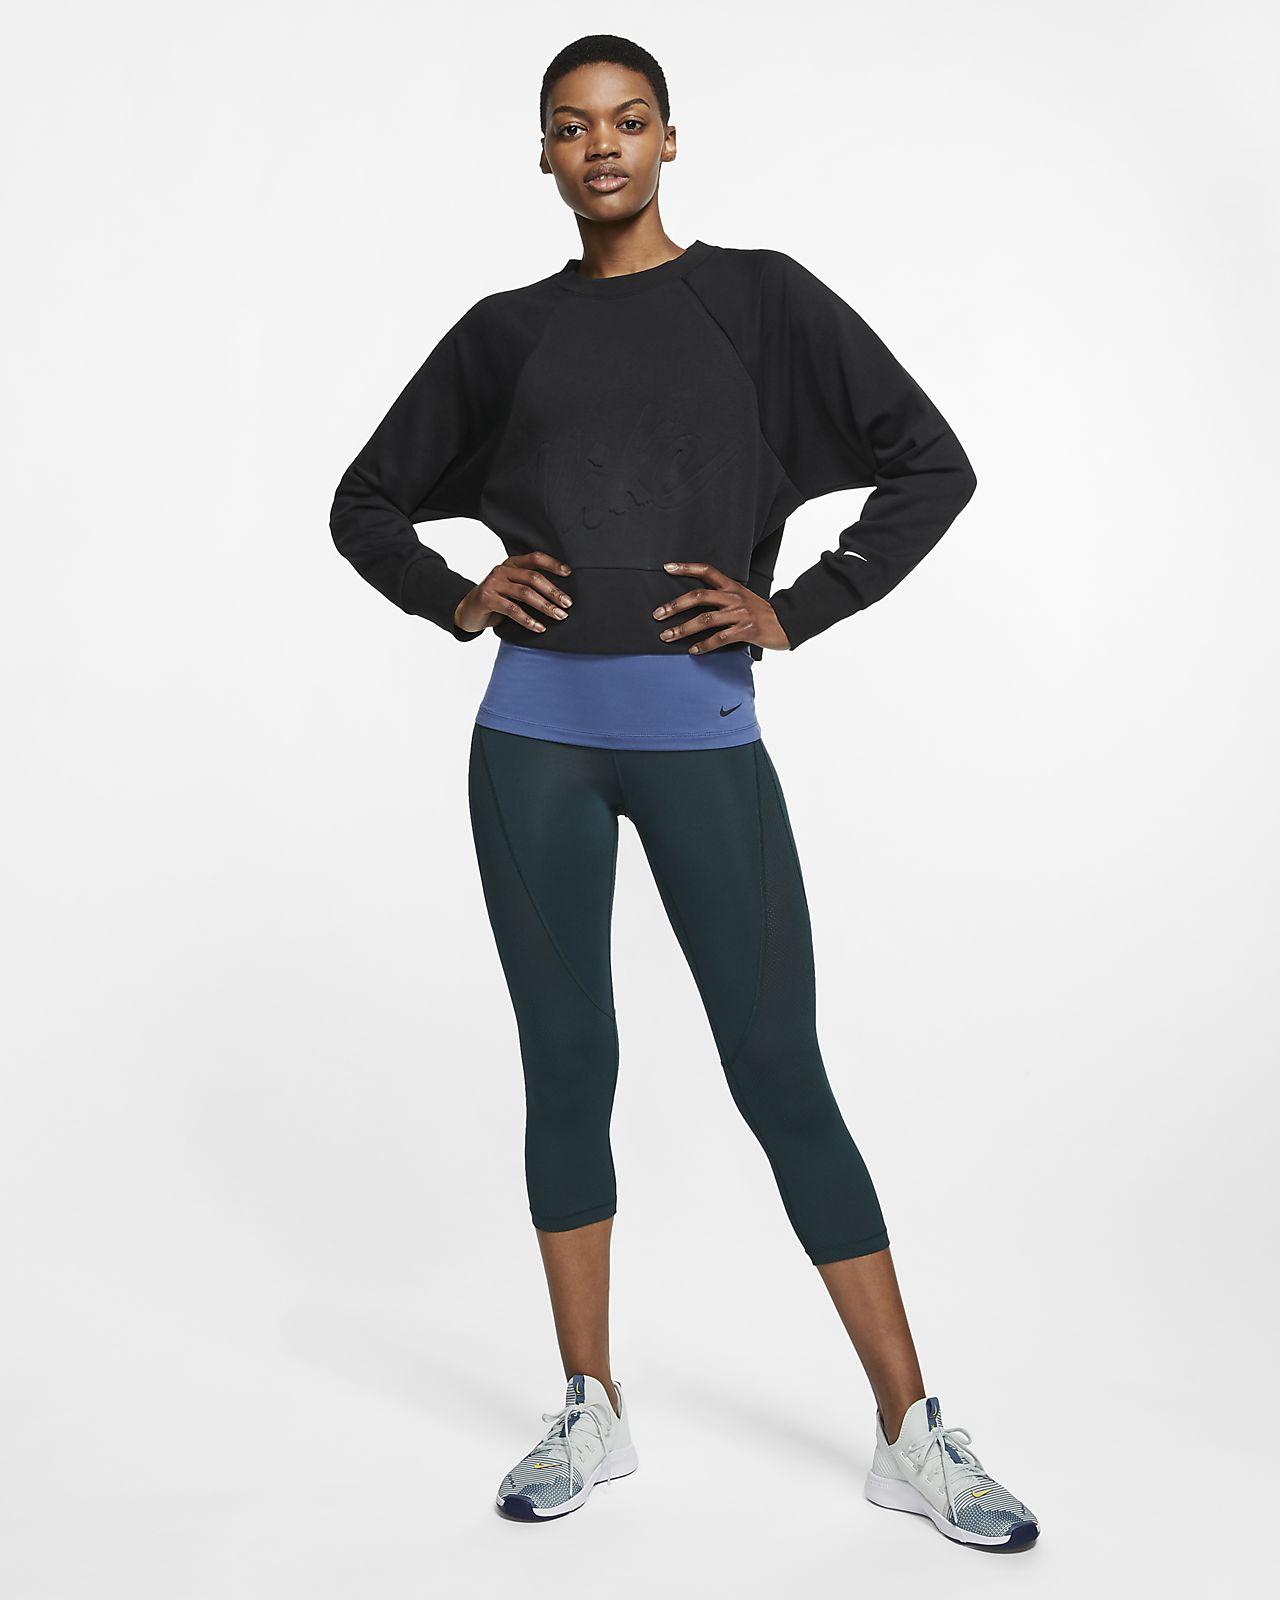 feb1a9e4 Nike Dri-FIT Get Fit treningsgenser i fleece til dame. Nike.com NO